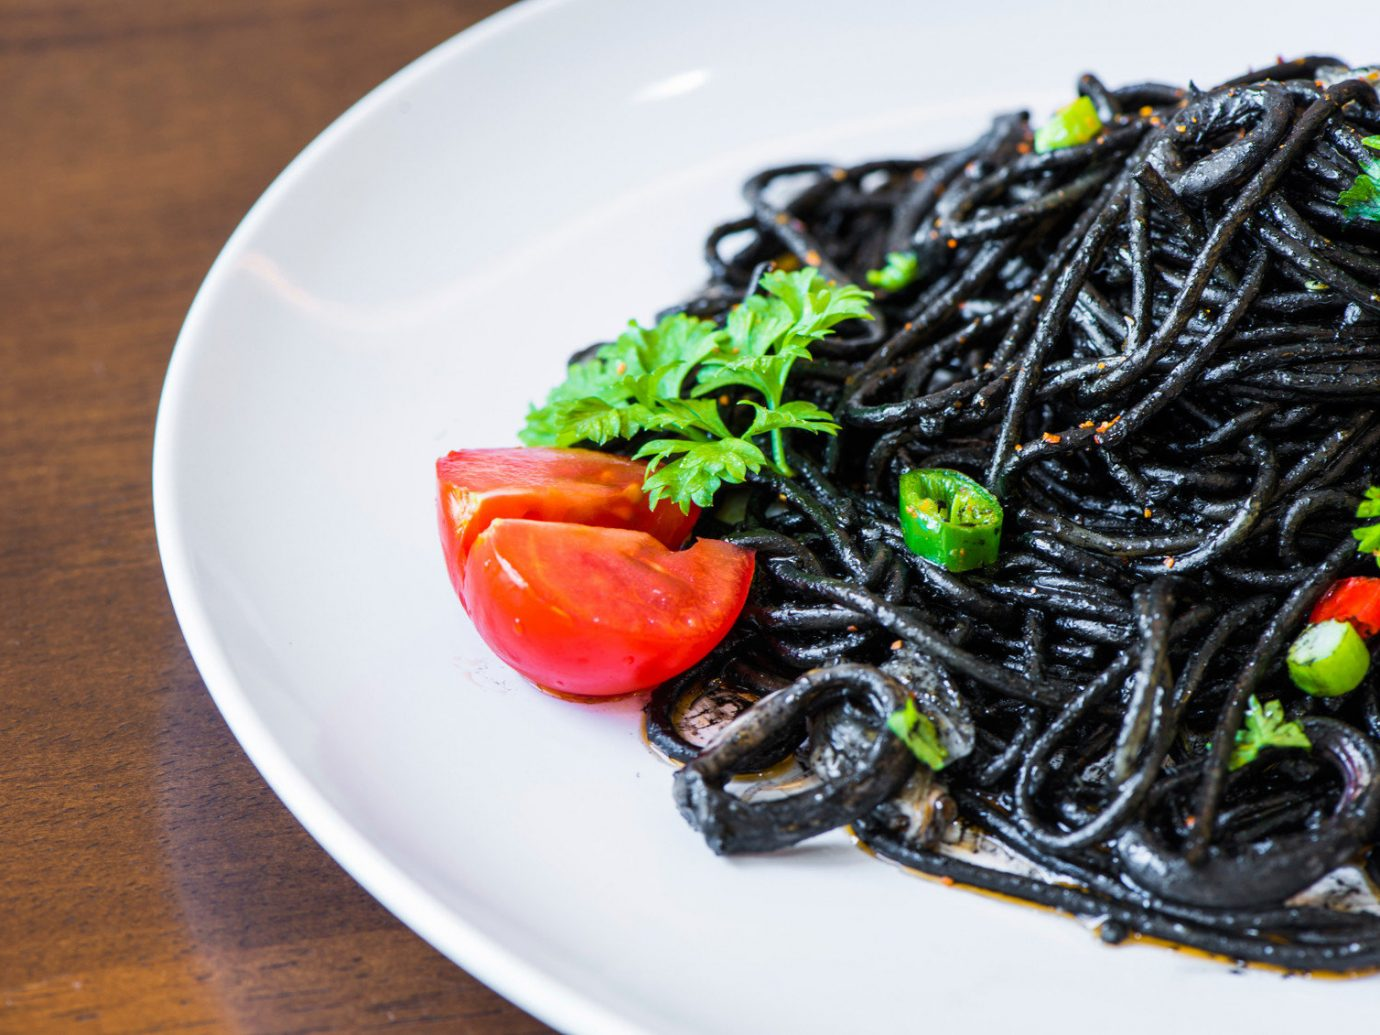 Arts + Culture plate table food dish produce vegetable cuisine asian food seaweed algae meat meal colorful sliced arranged